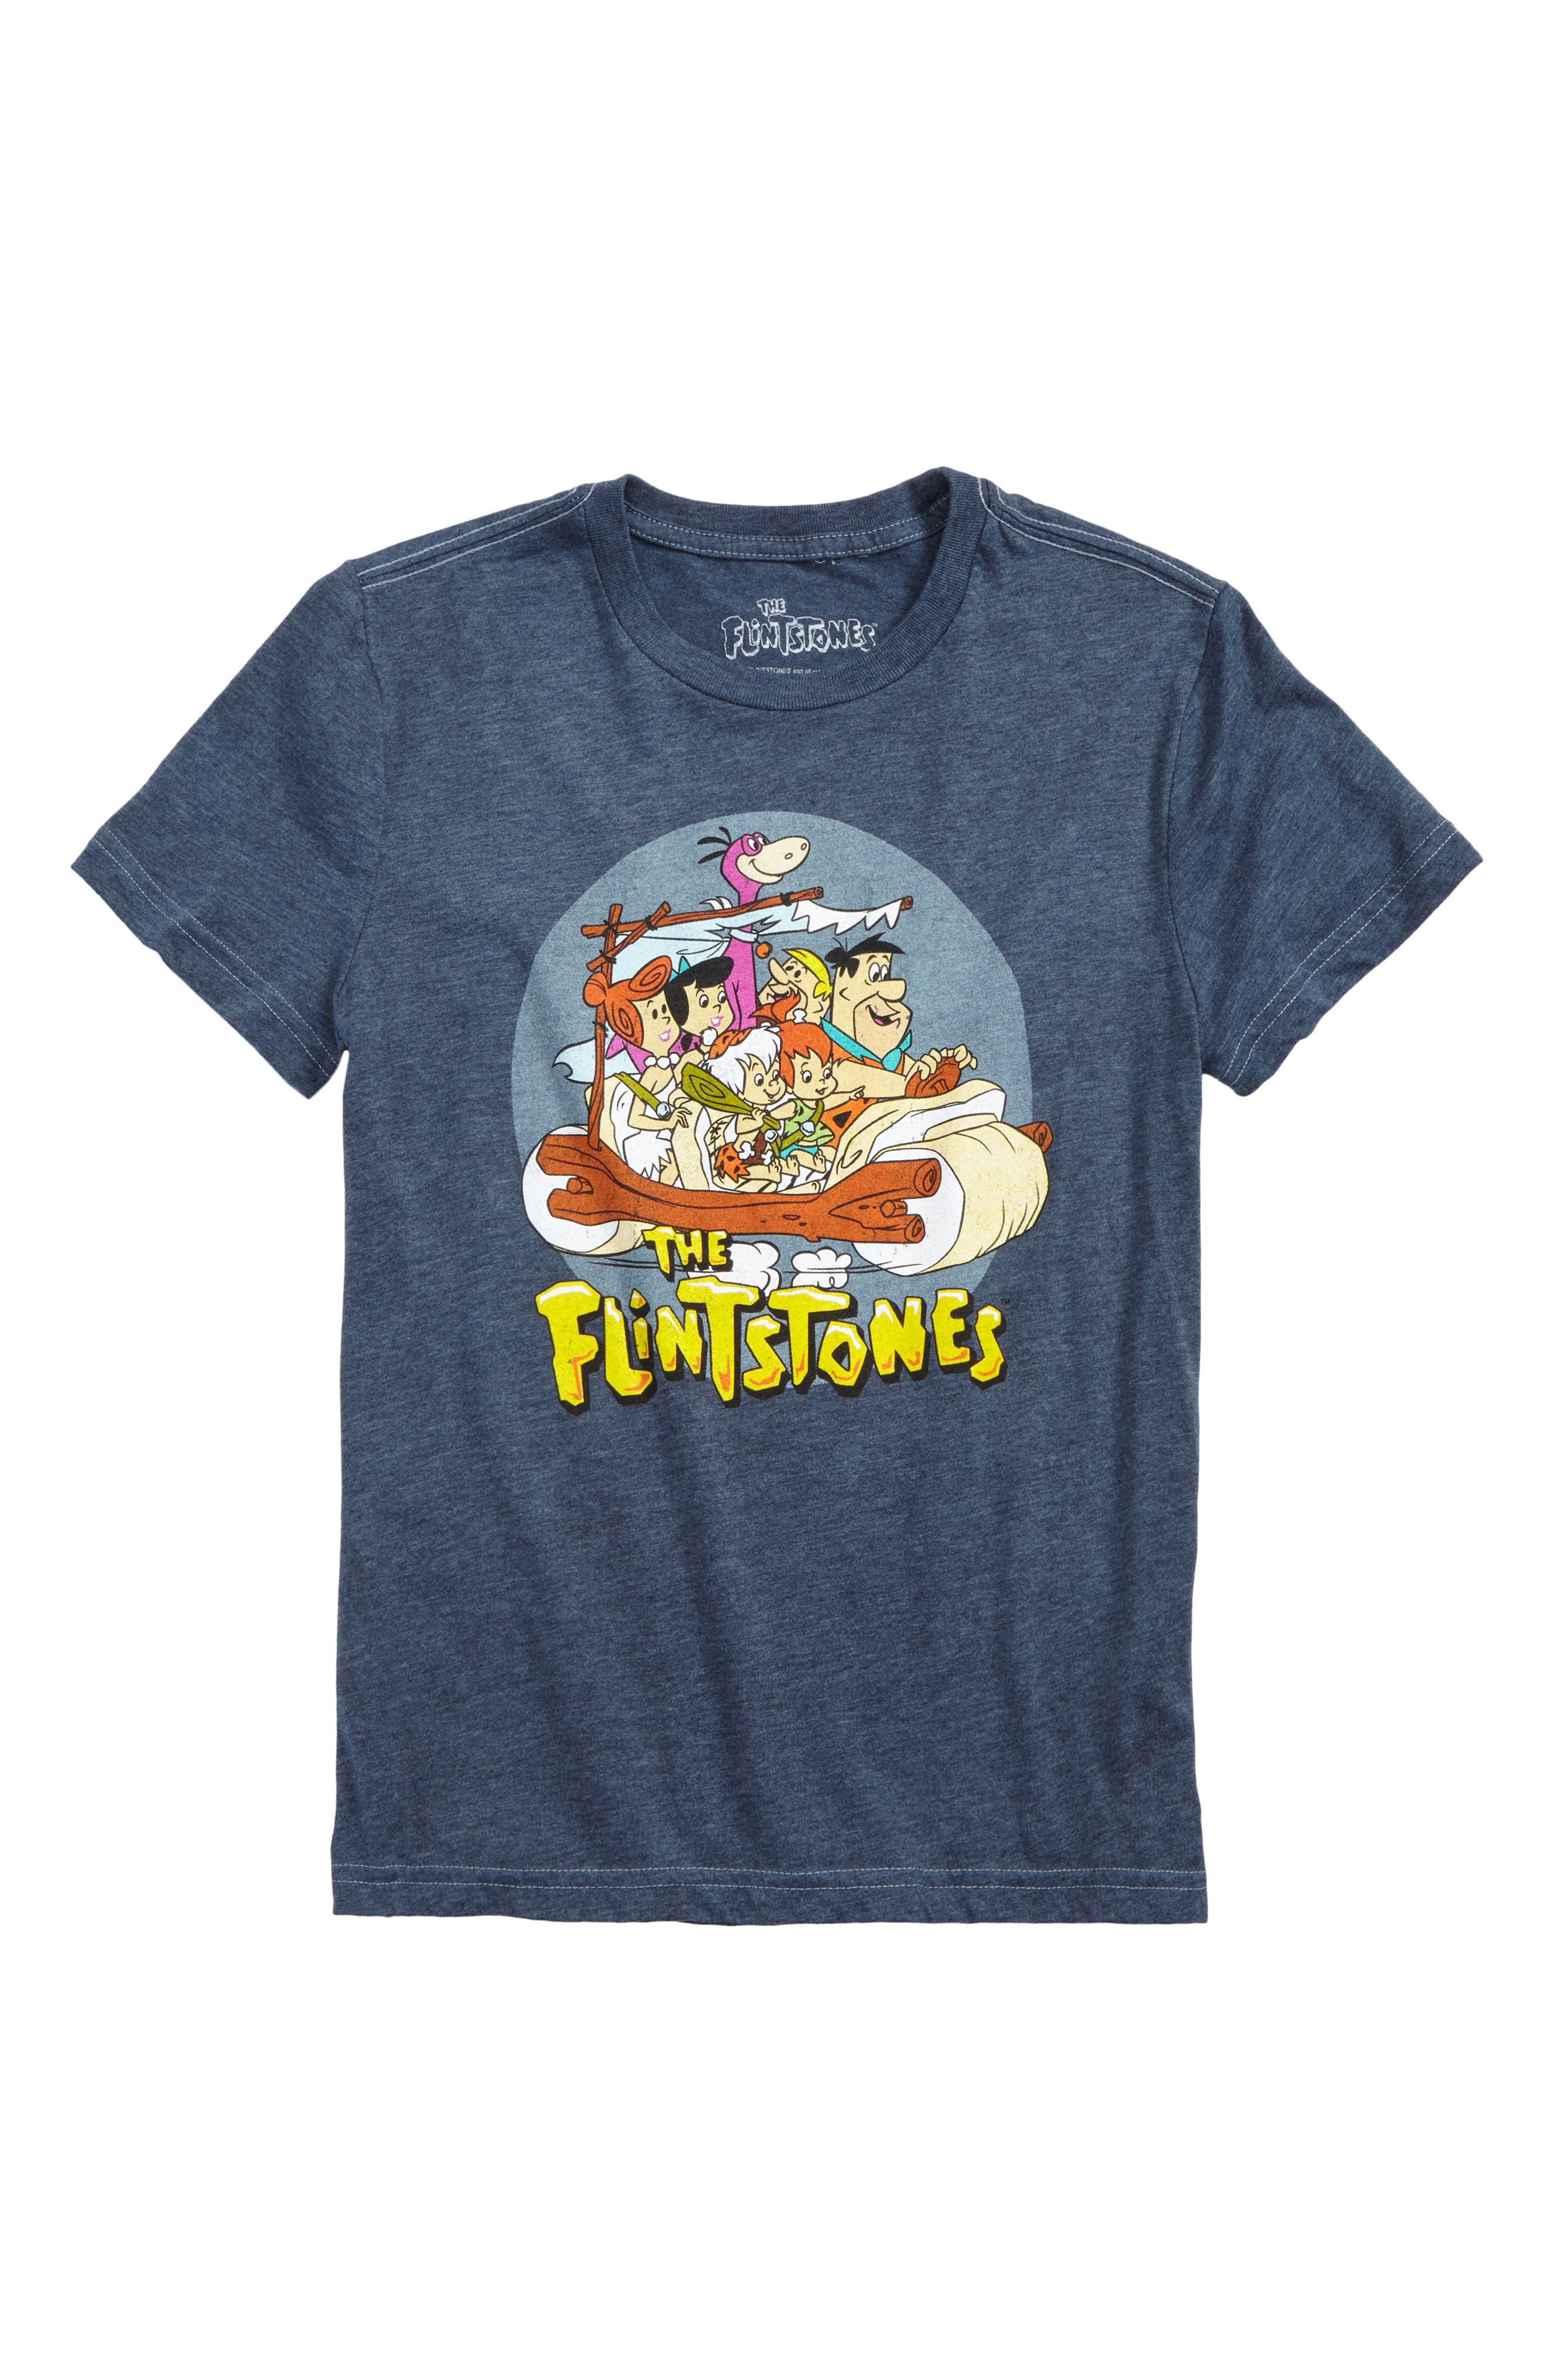 Main Image - Jem Flintstones Family Graphic T-Shirt (Big Boys)